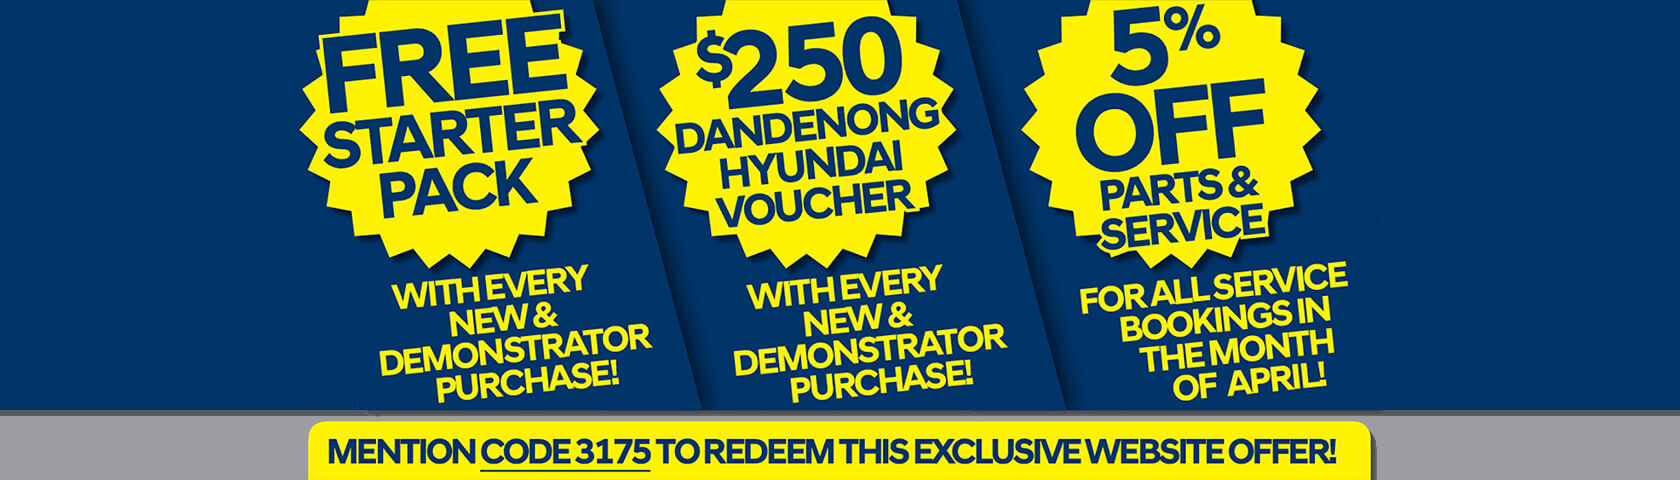 Dandenong Hyundai April Offers